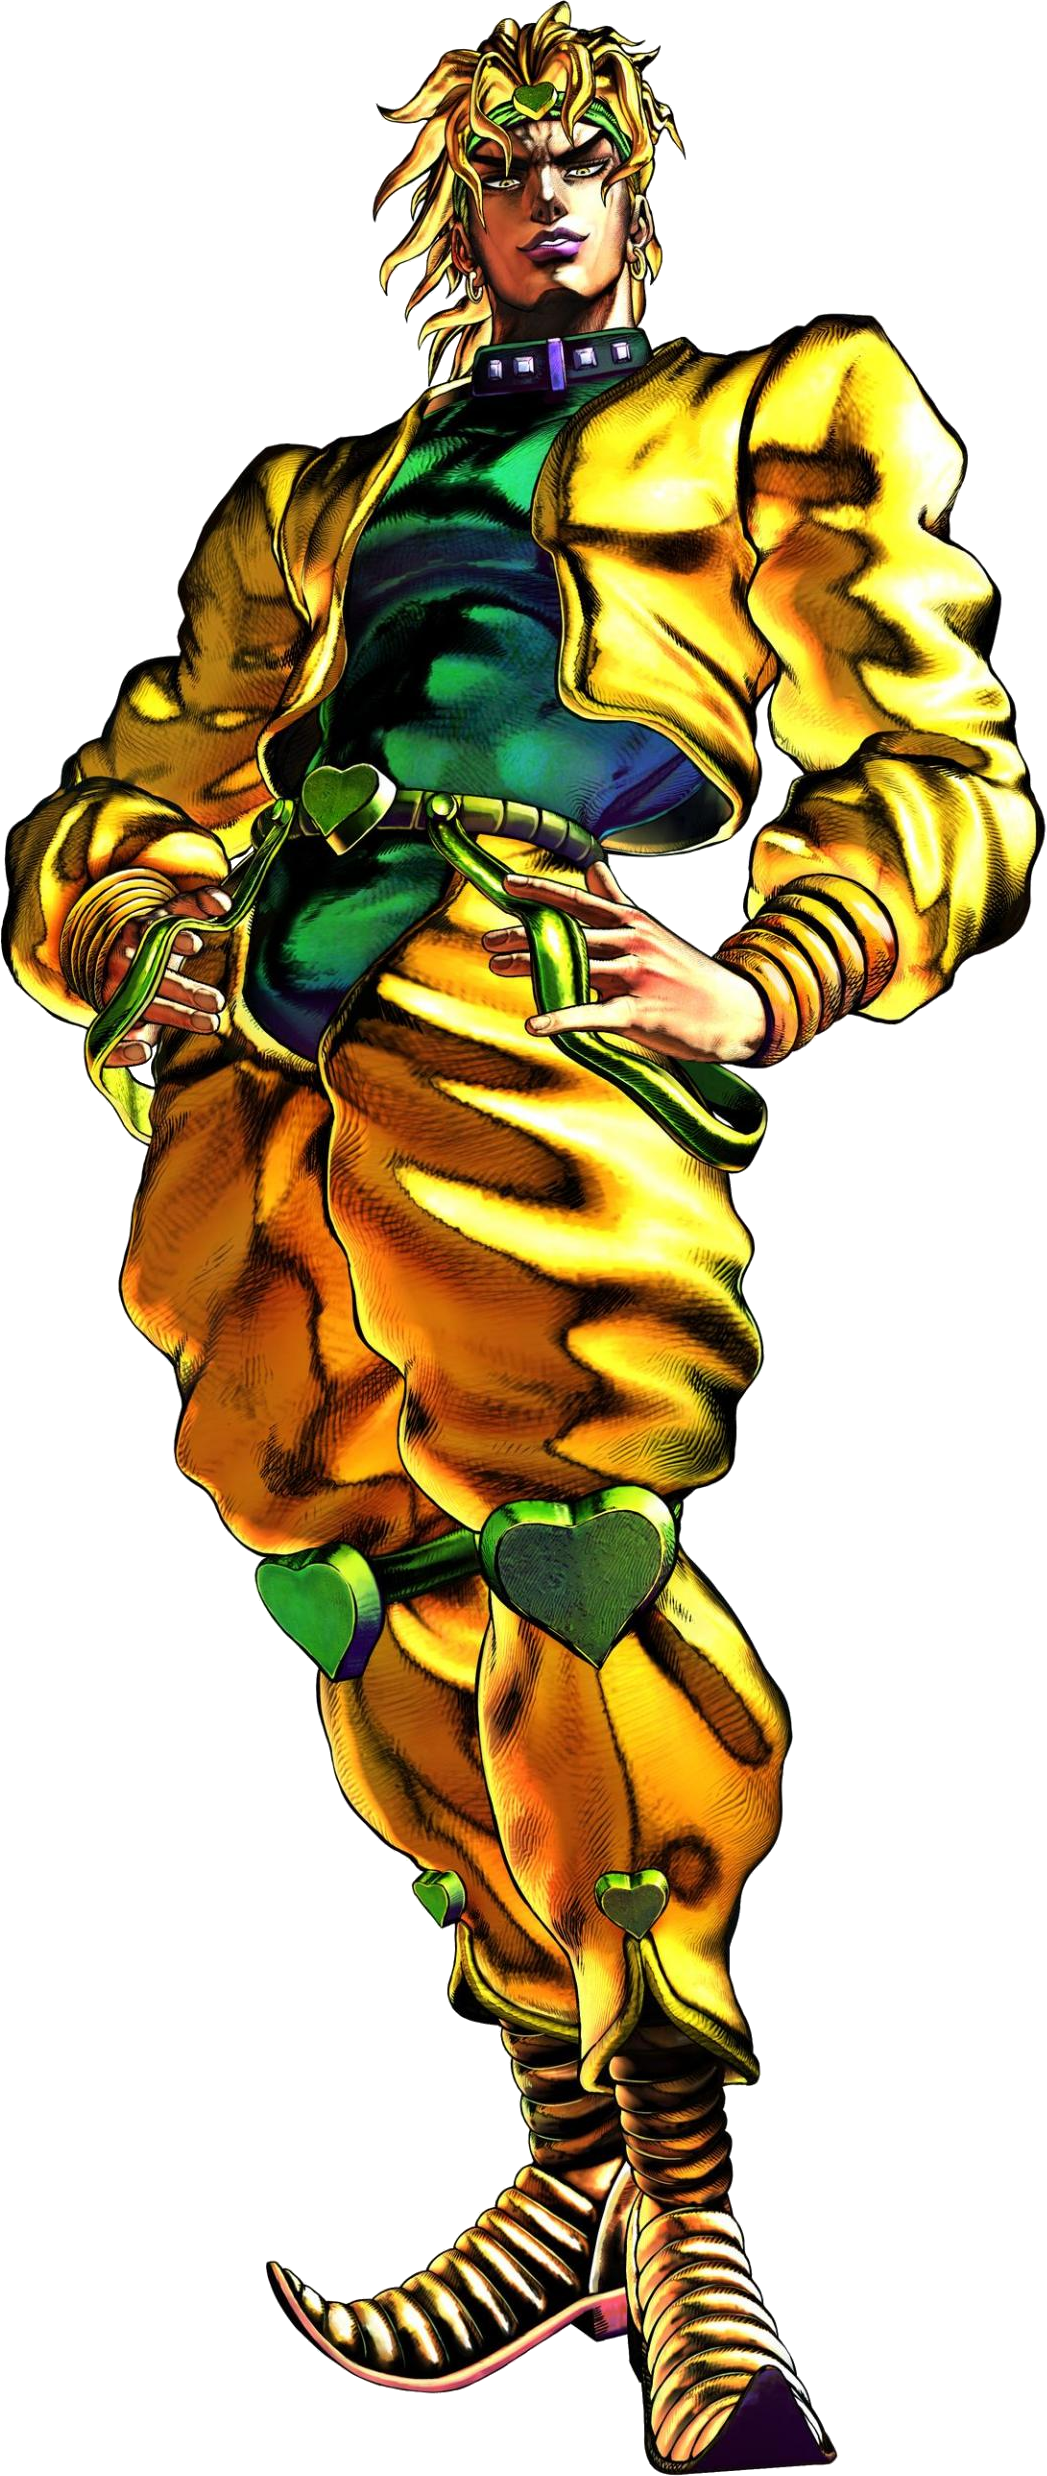 B.O.K.O/DIO | Fantendo - Nintendo Fanon Wiki | Fandom